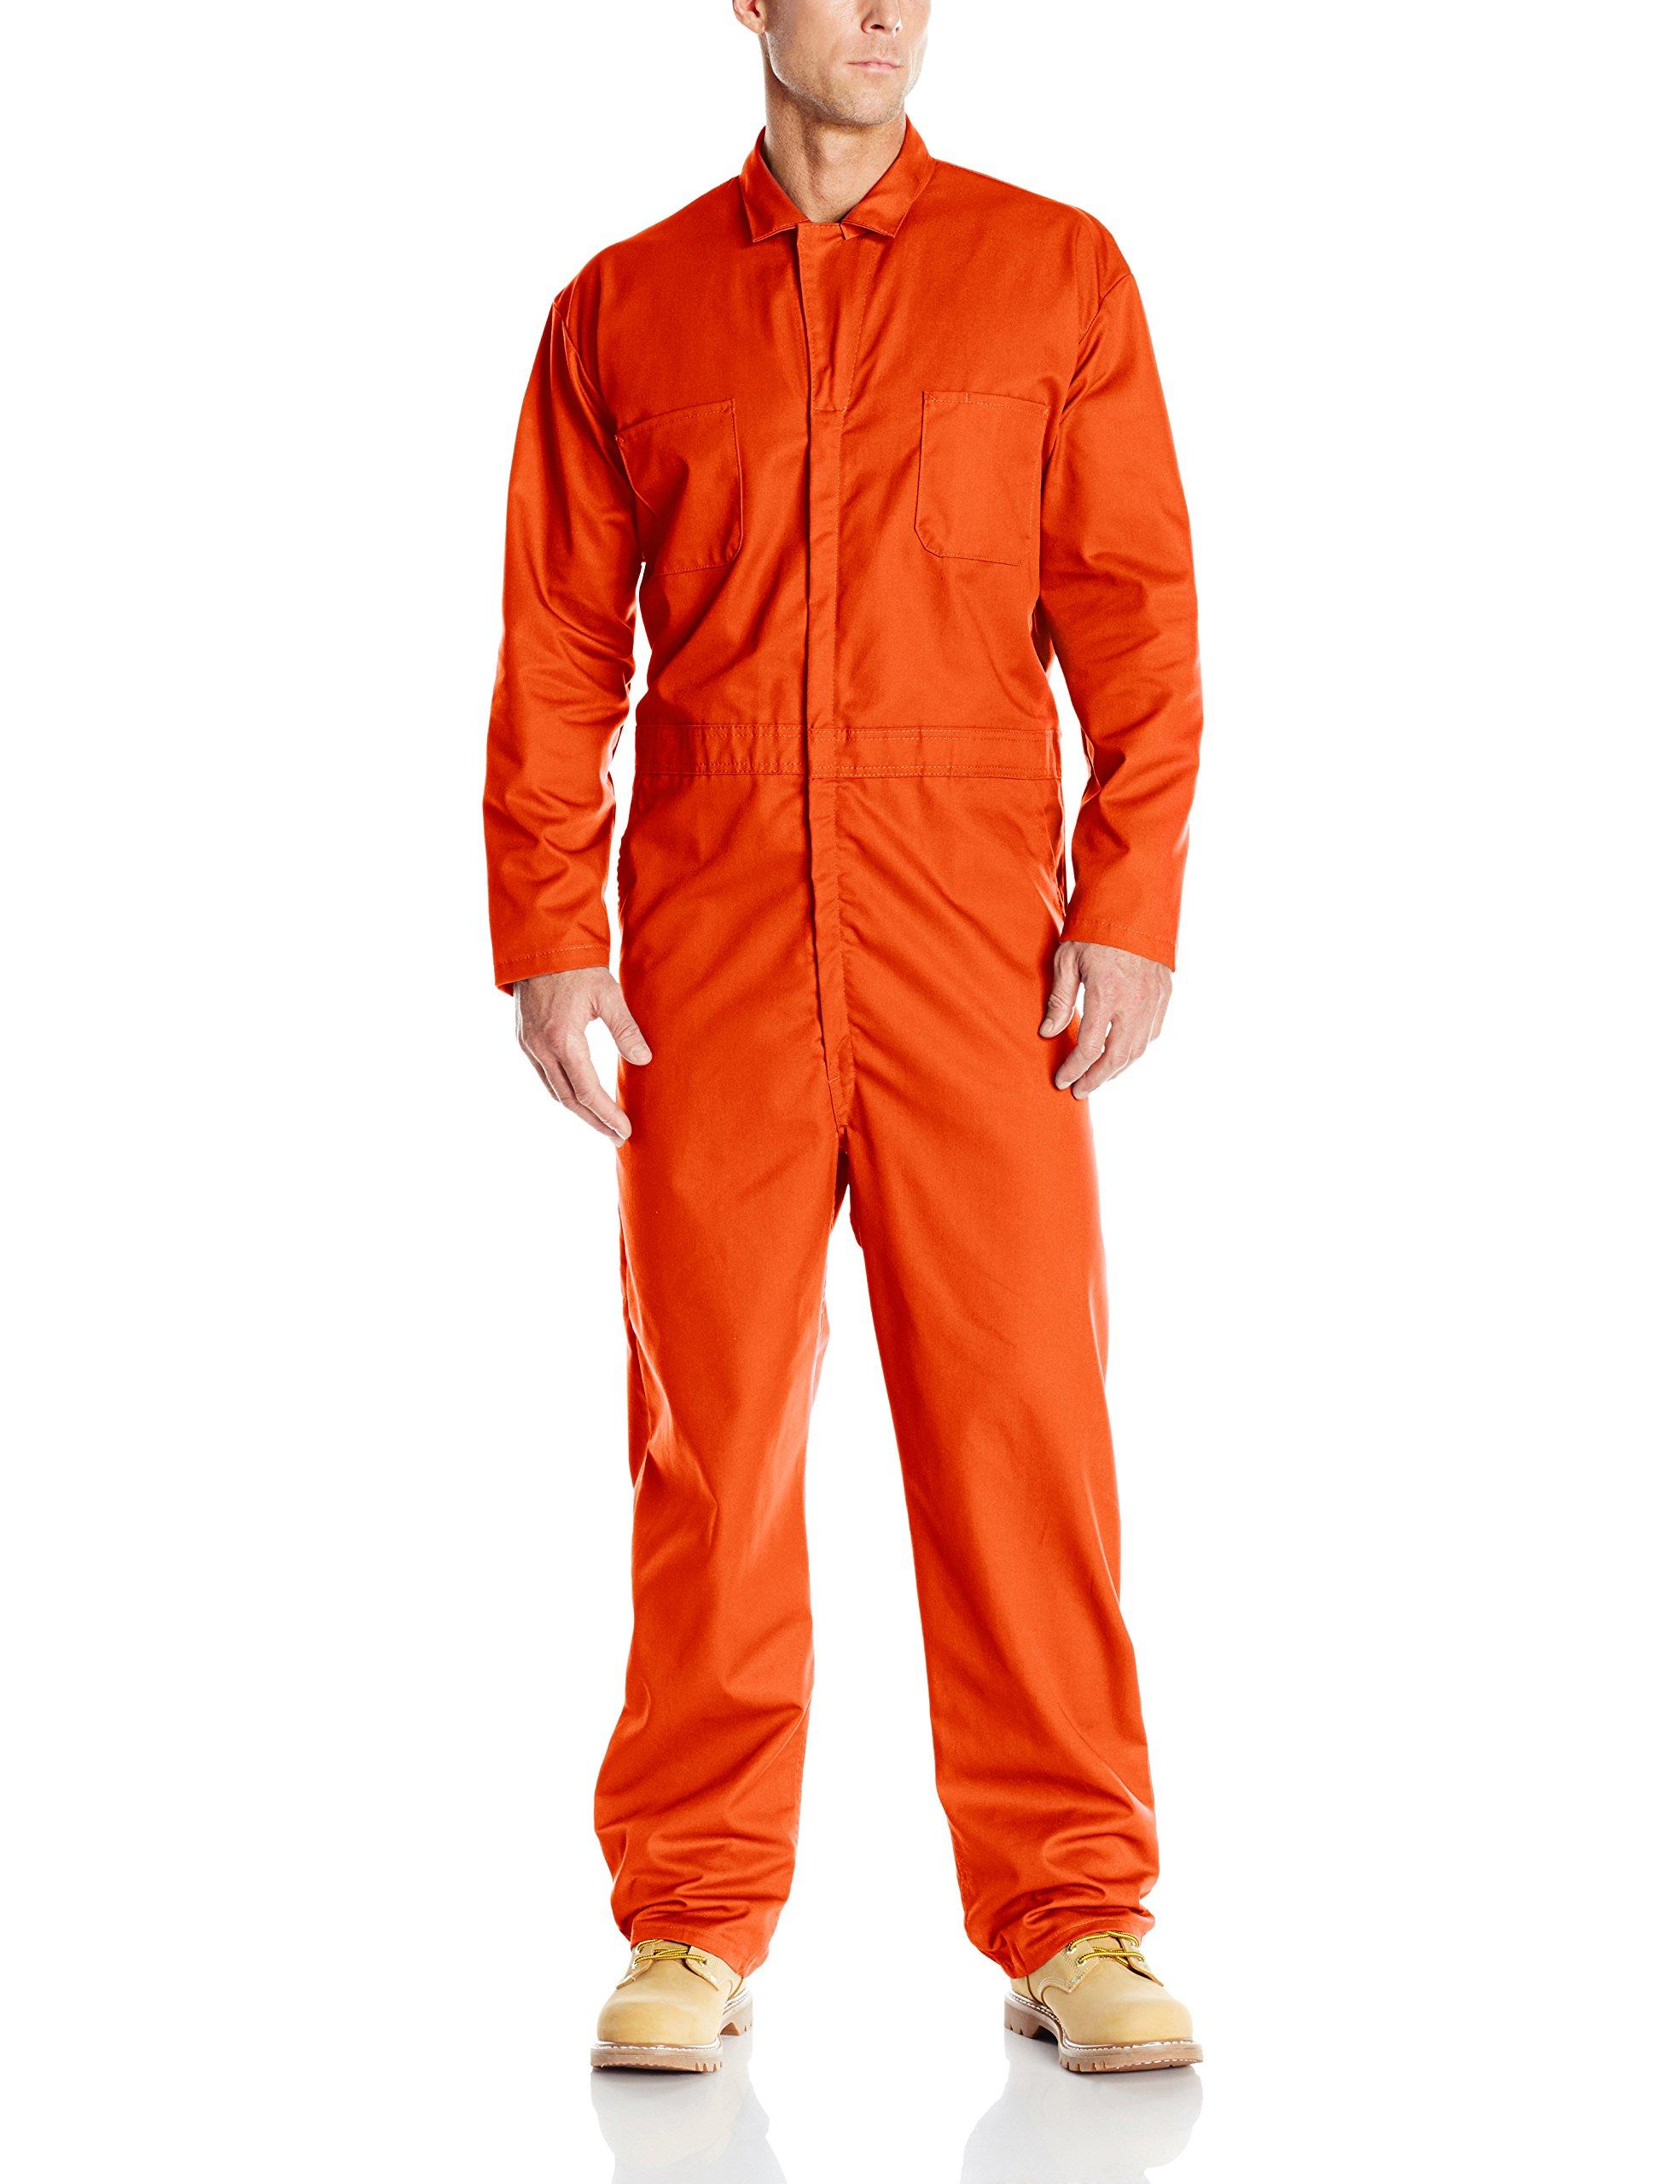 Red Kap Men's Twill Action Back Coverall, Orange, 38